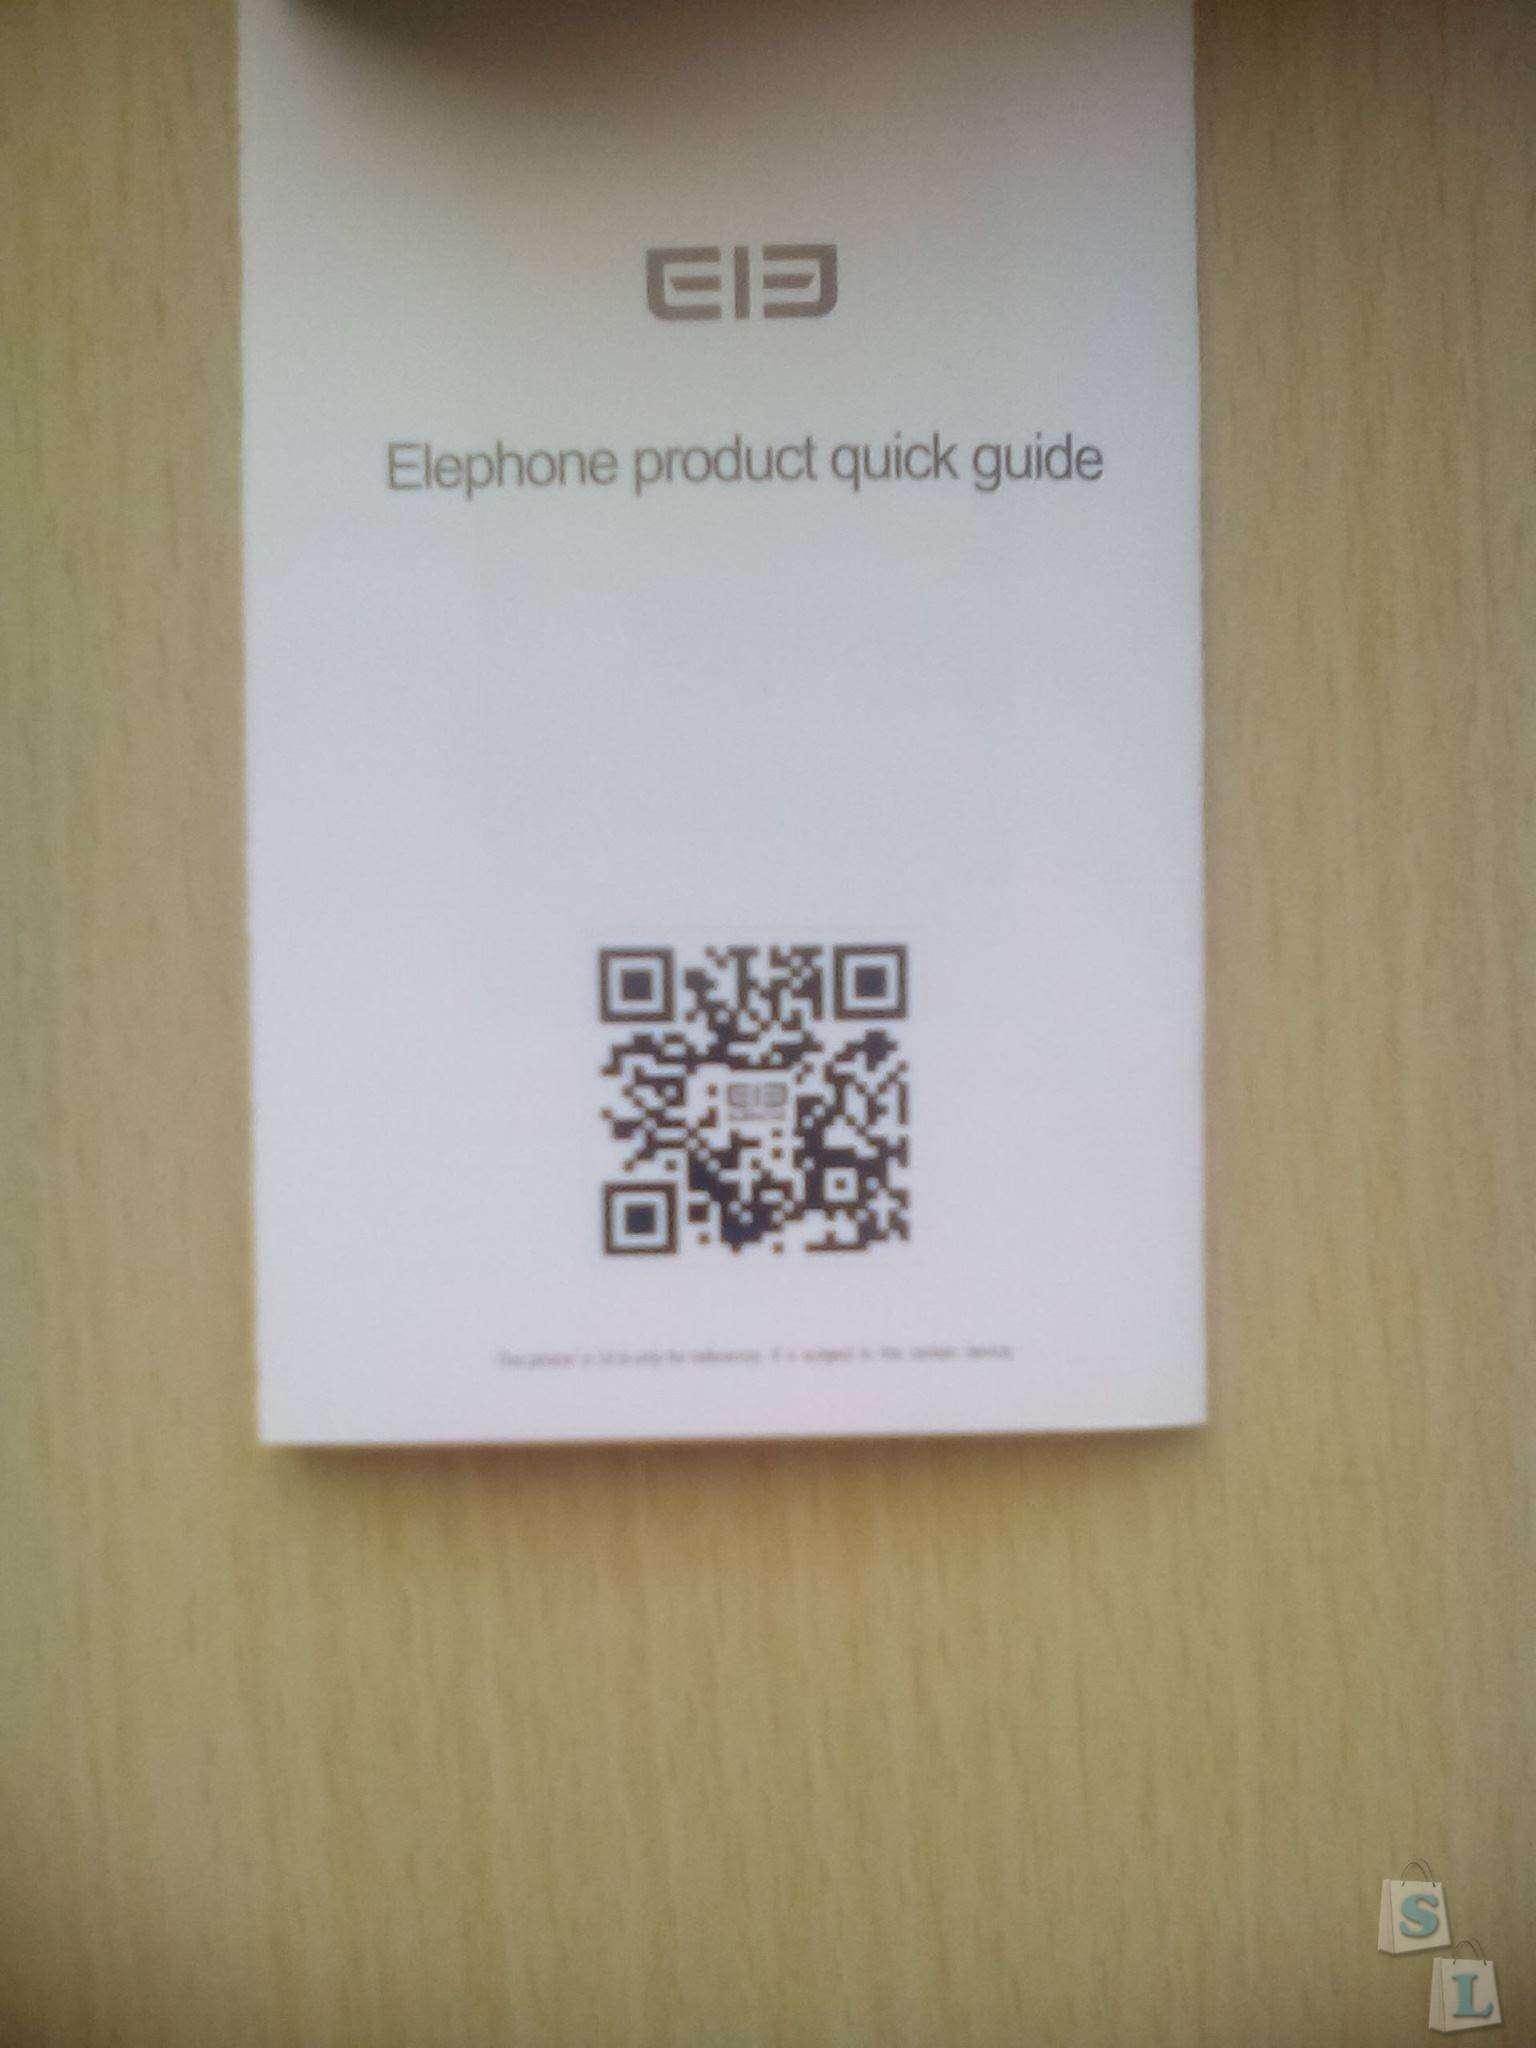 Aliexpress: Elephone G1 - смартфон за 60$